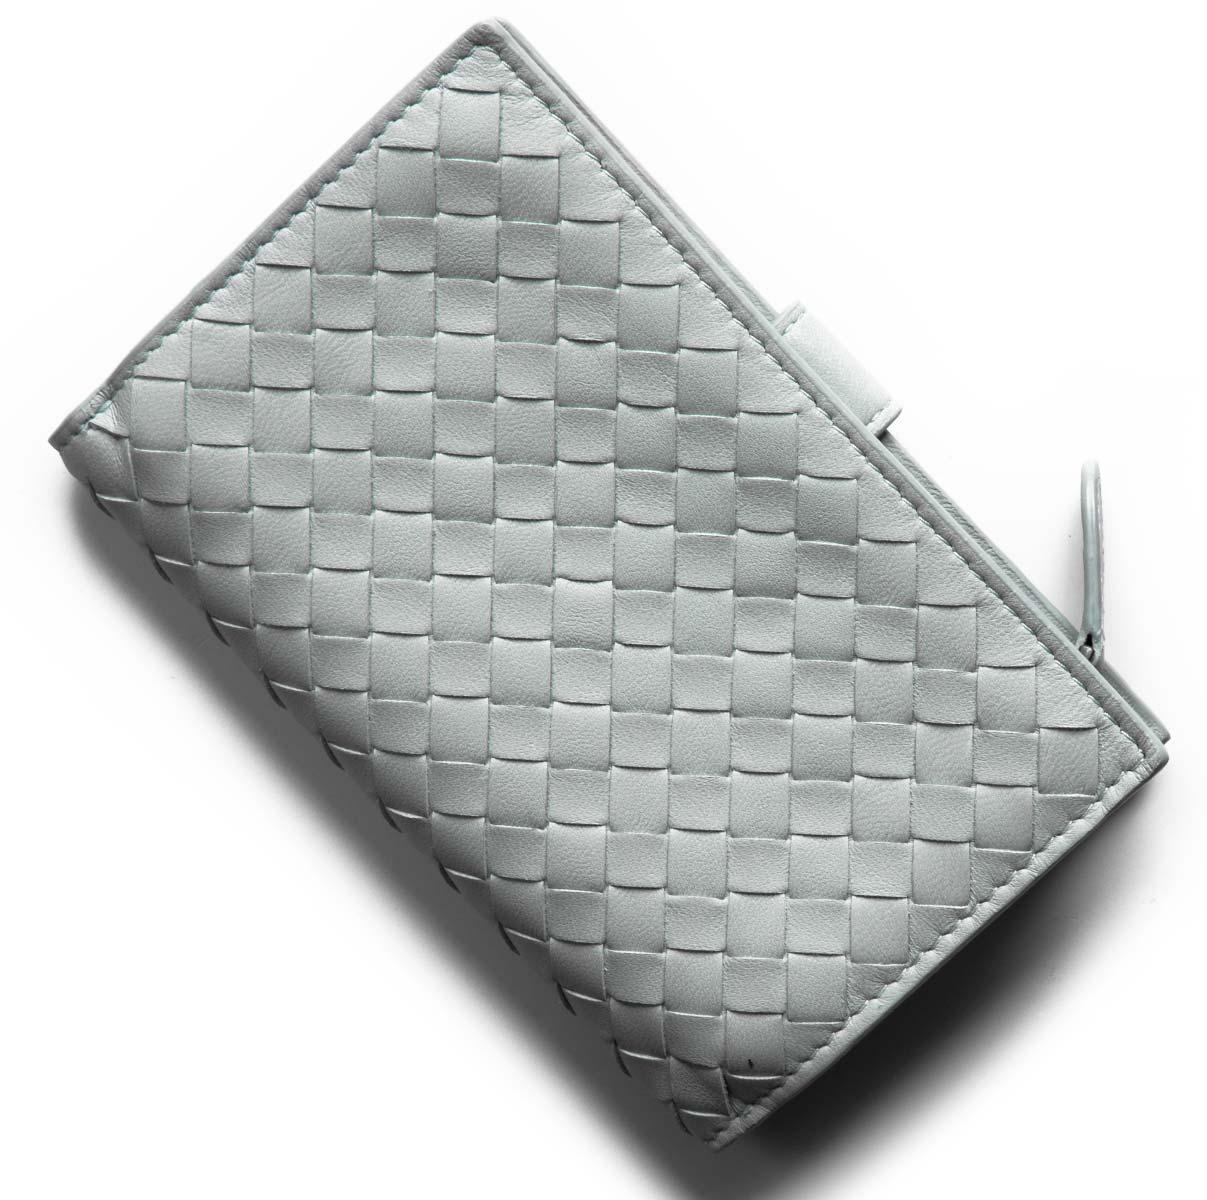 buy popular 8fb31 ab248 ブルーク】ボッテガヴェネタ (ボッテガ・ヴェネタ) 二つ折り財布 ...